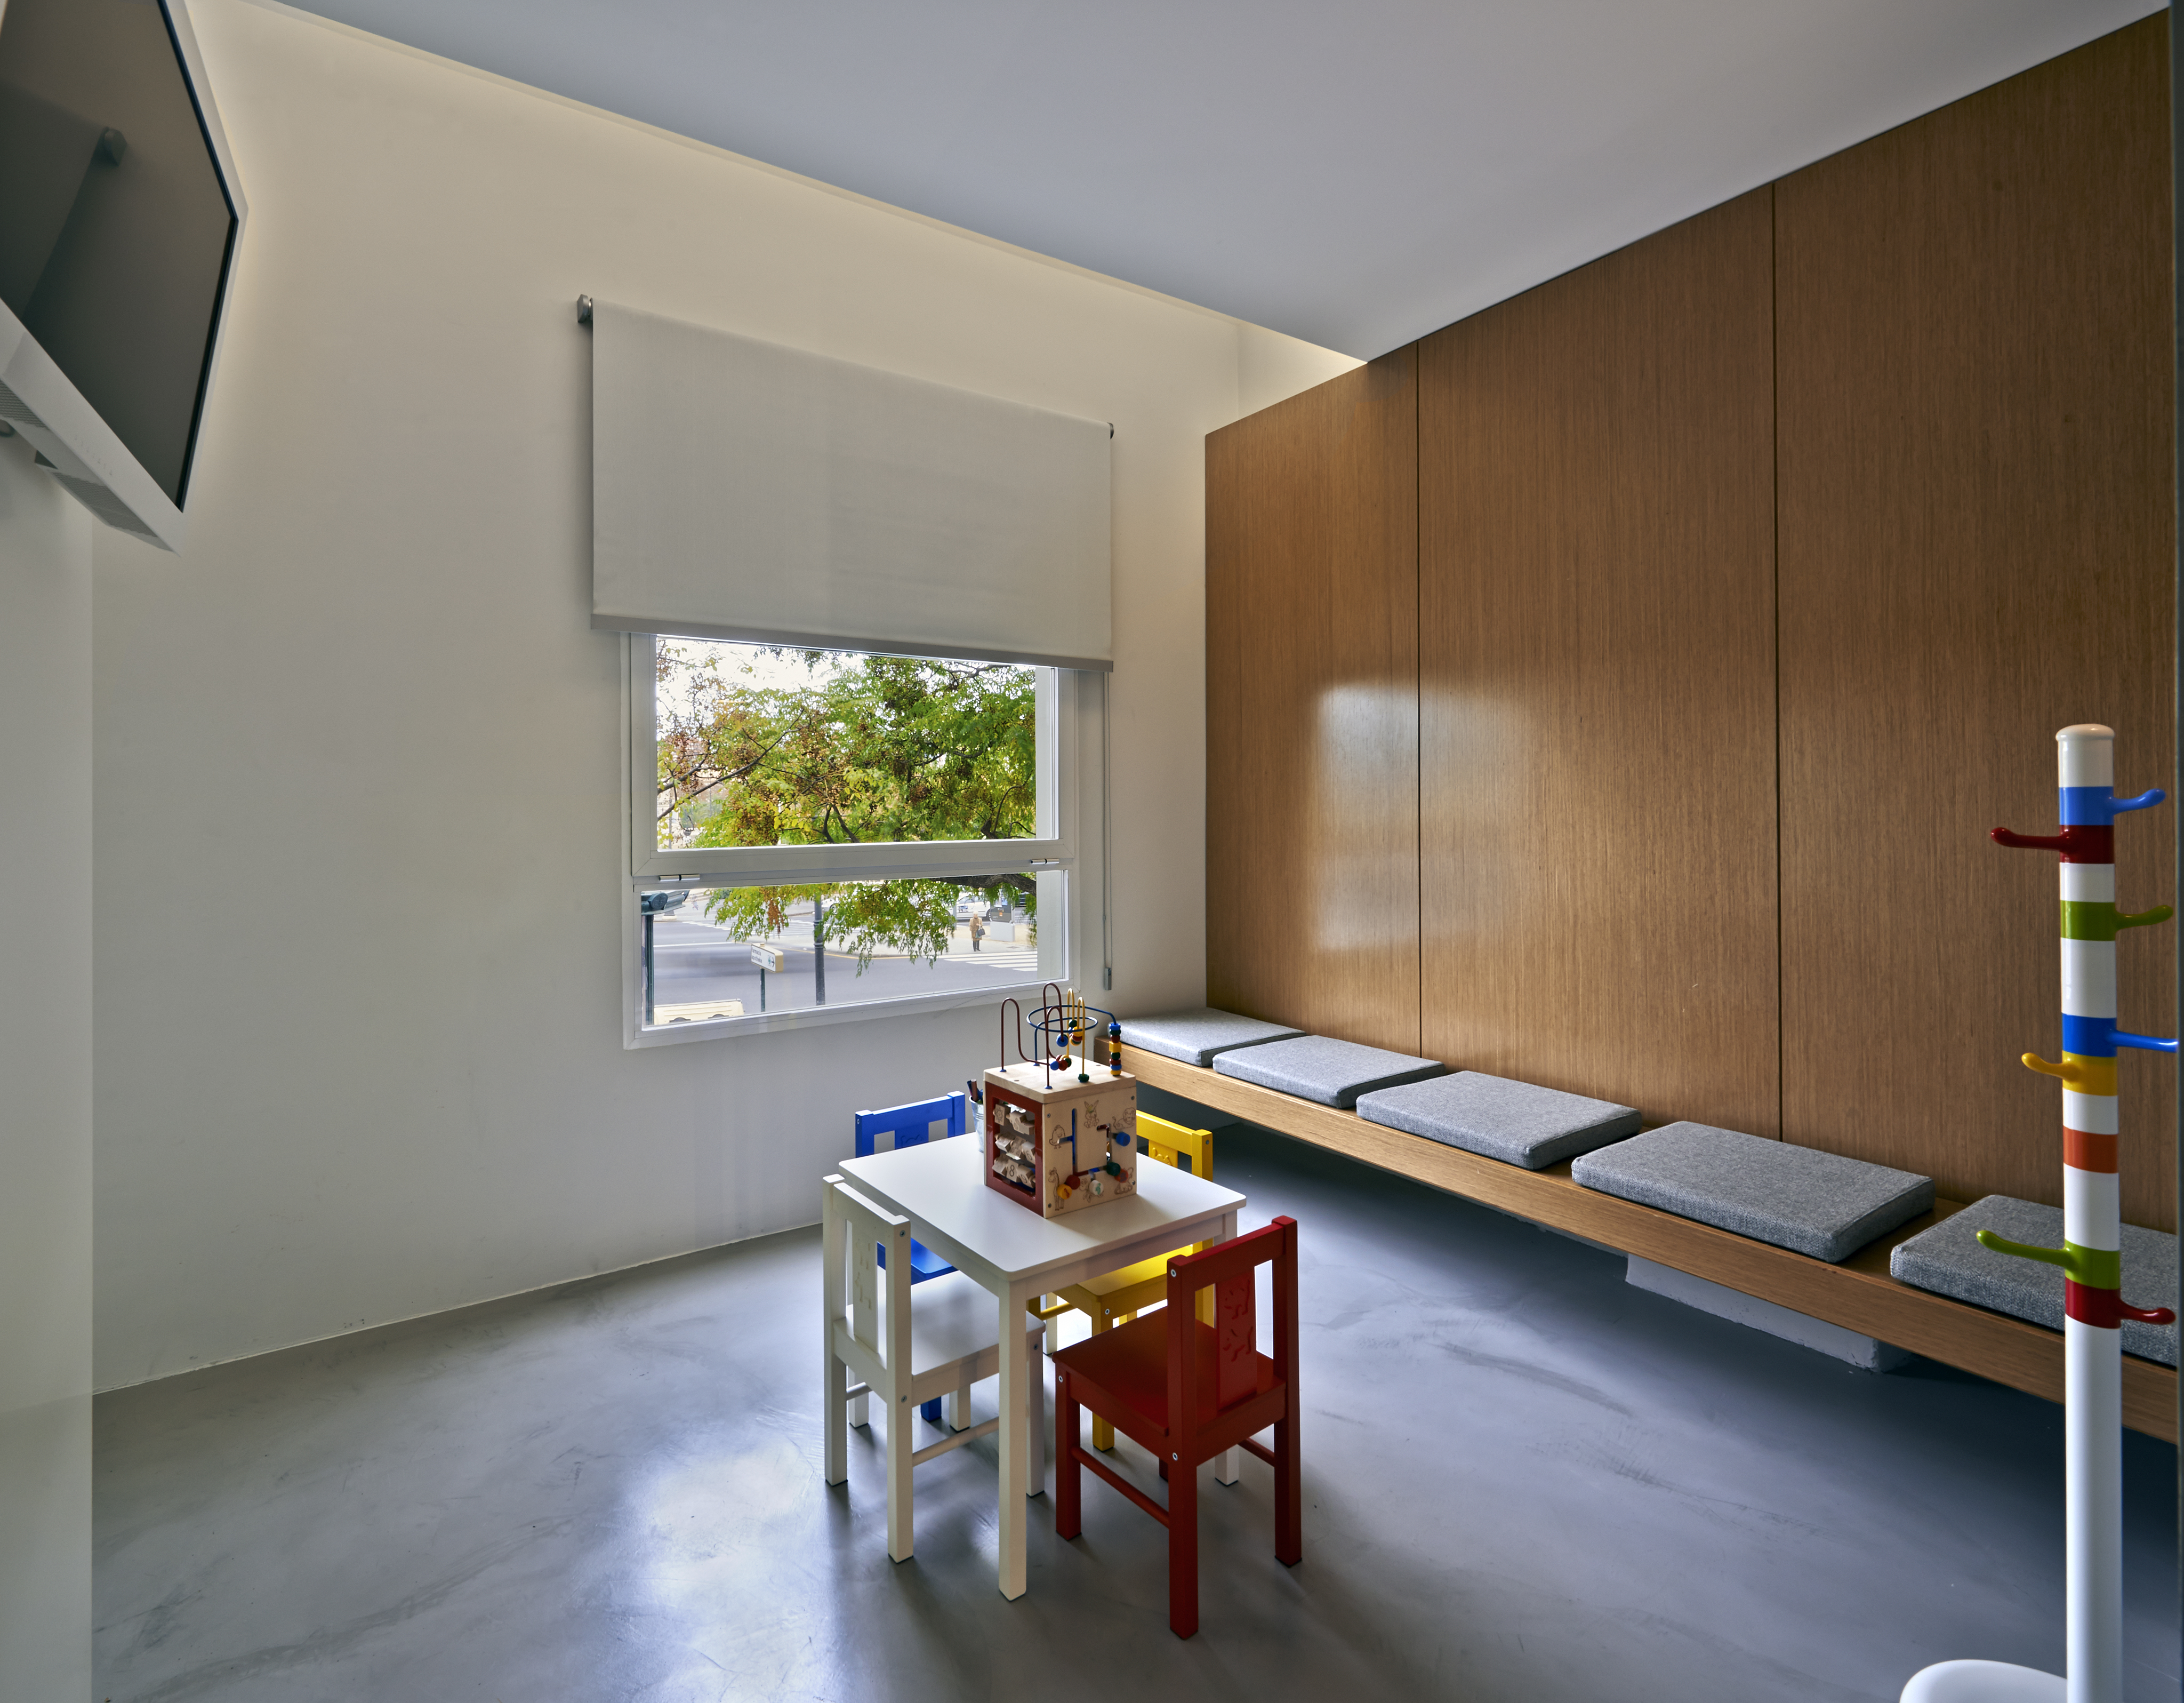 Sala de espera pediátrica